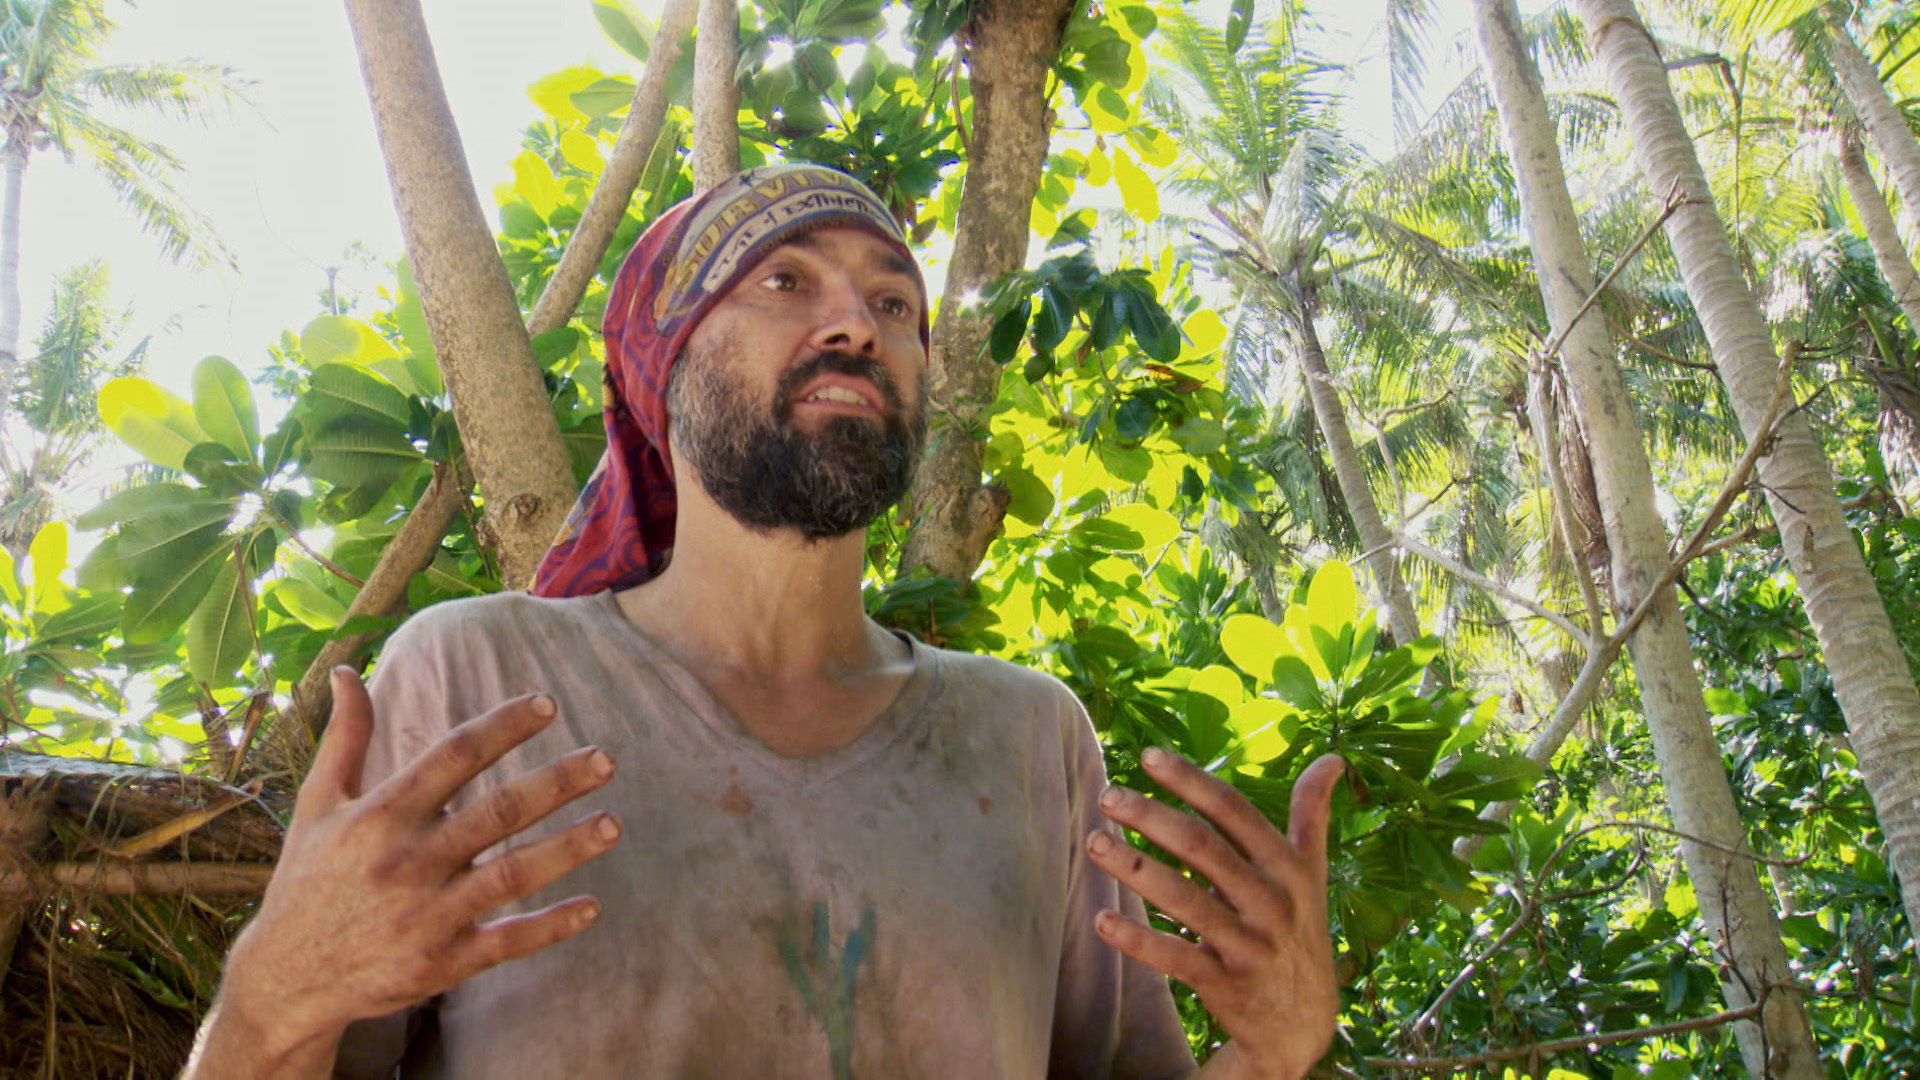 Watch Survivor Season 38 Episode 9: Blood of a Blindside - Full show on CBS  All Access